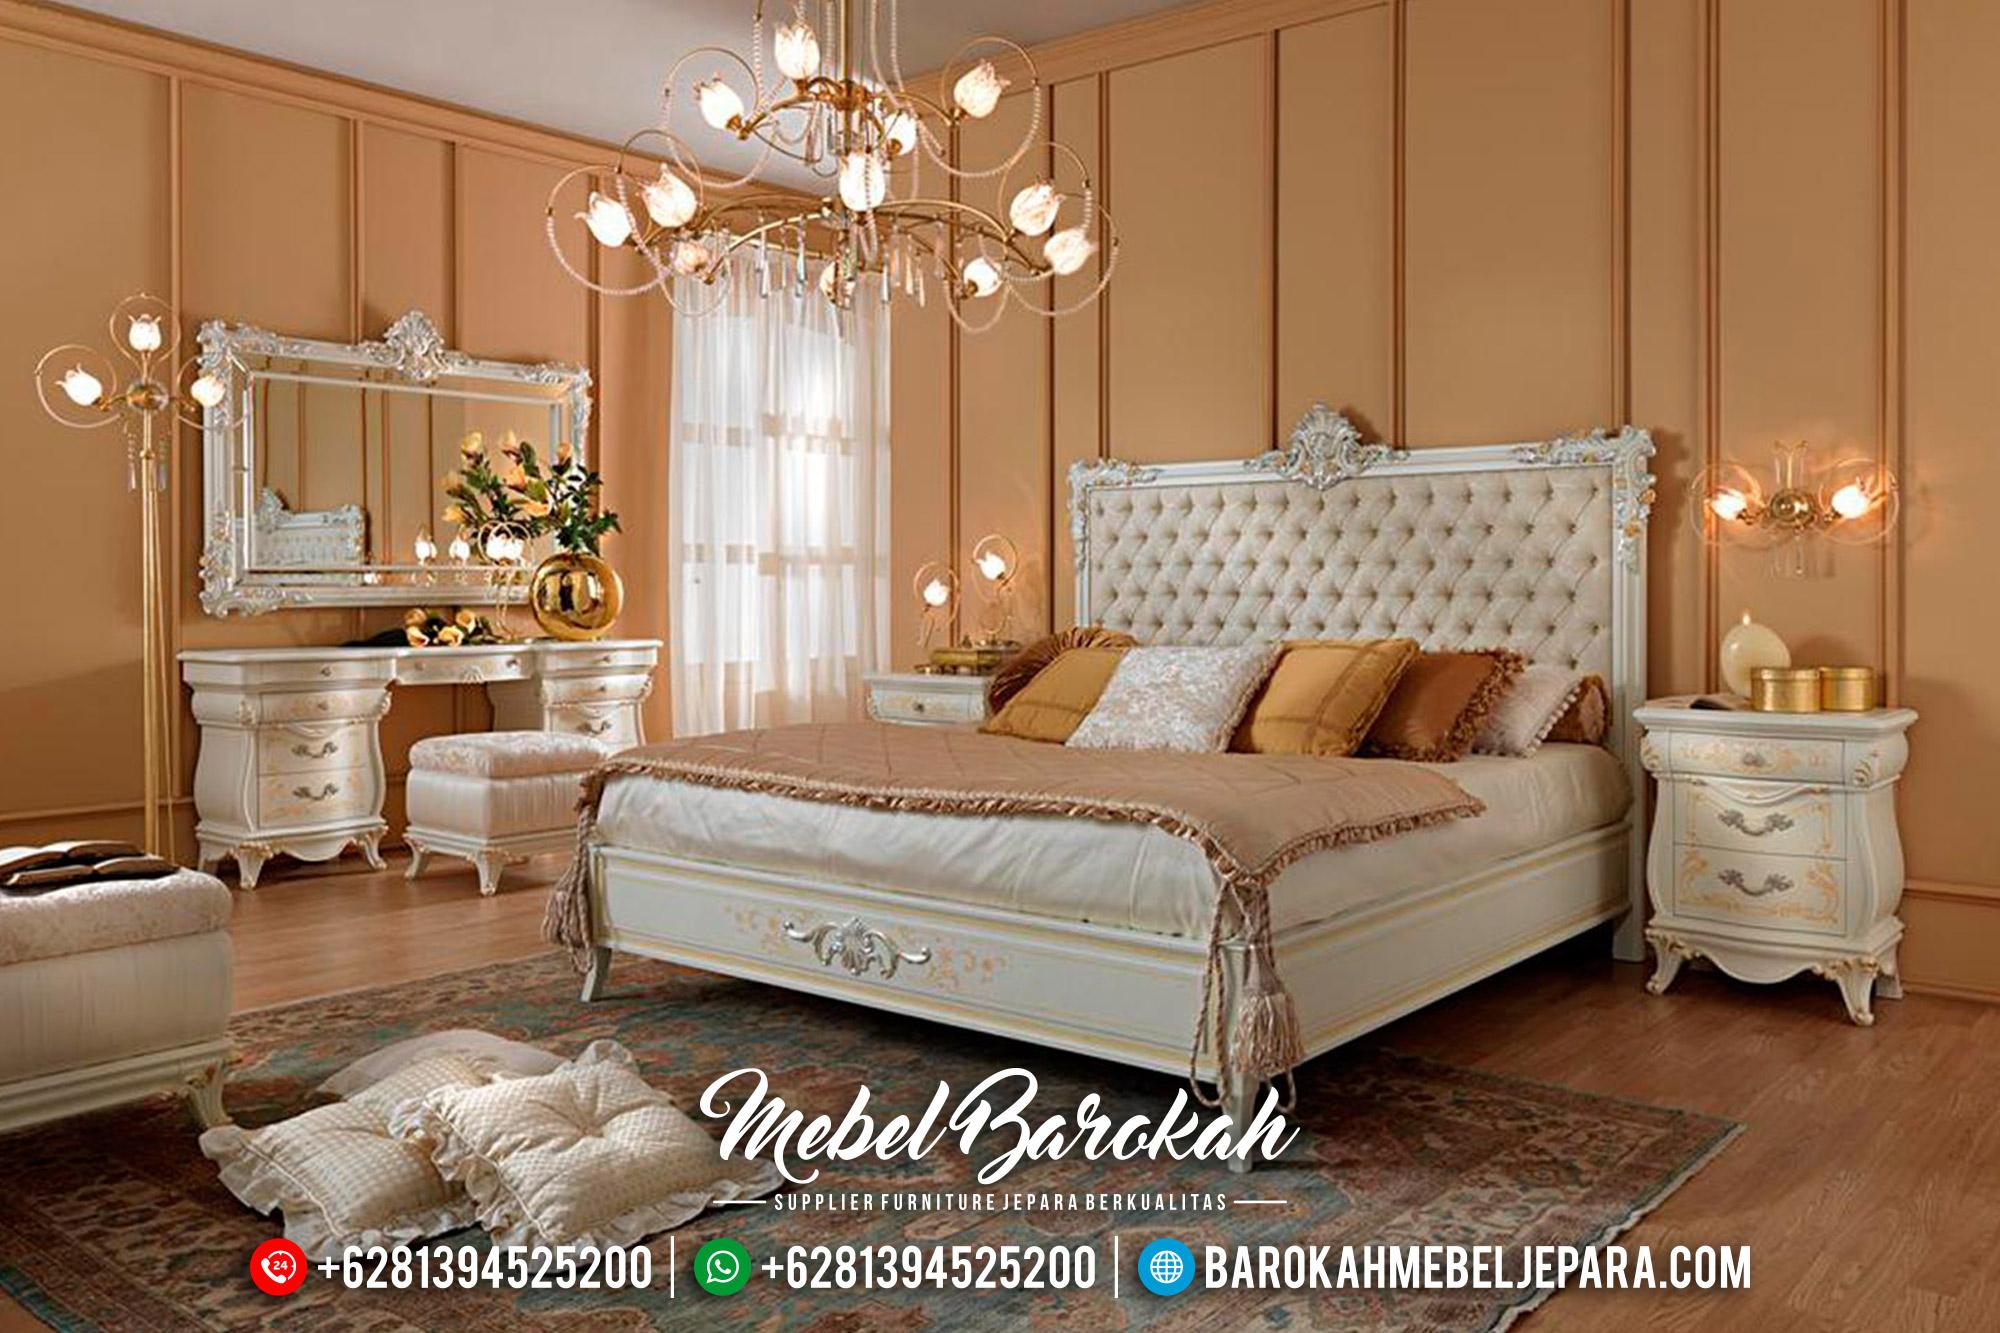 Architecture Kamar Set Mewah Ukiran Jepara Luxury Carving New Product Release MB-0537